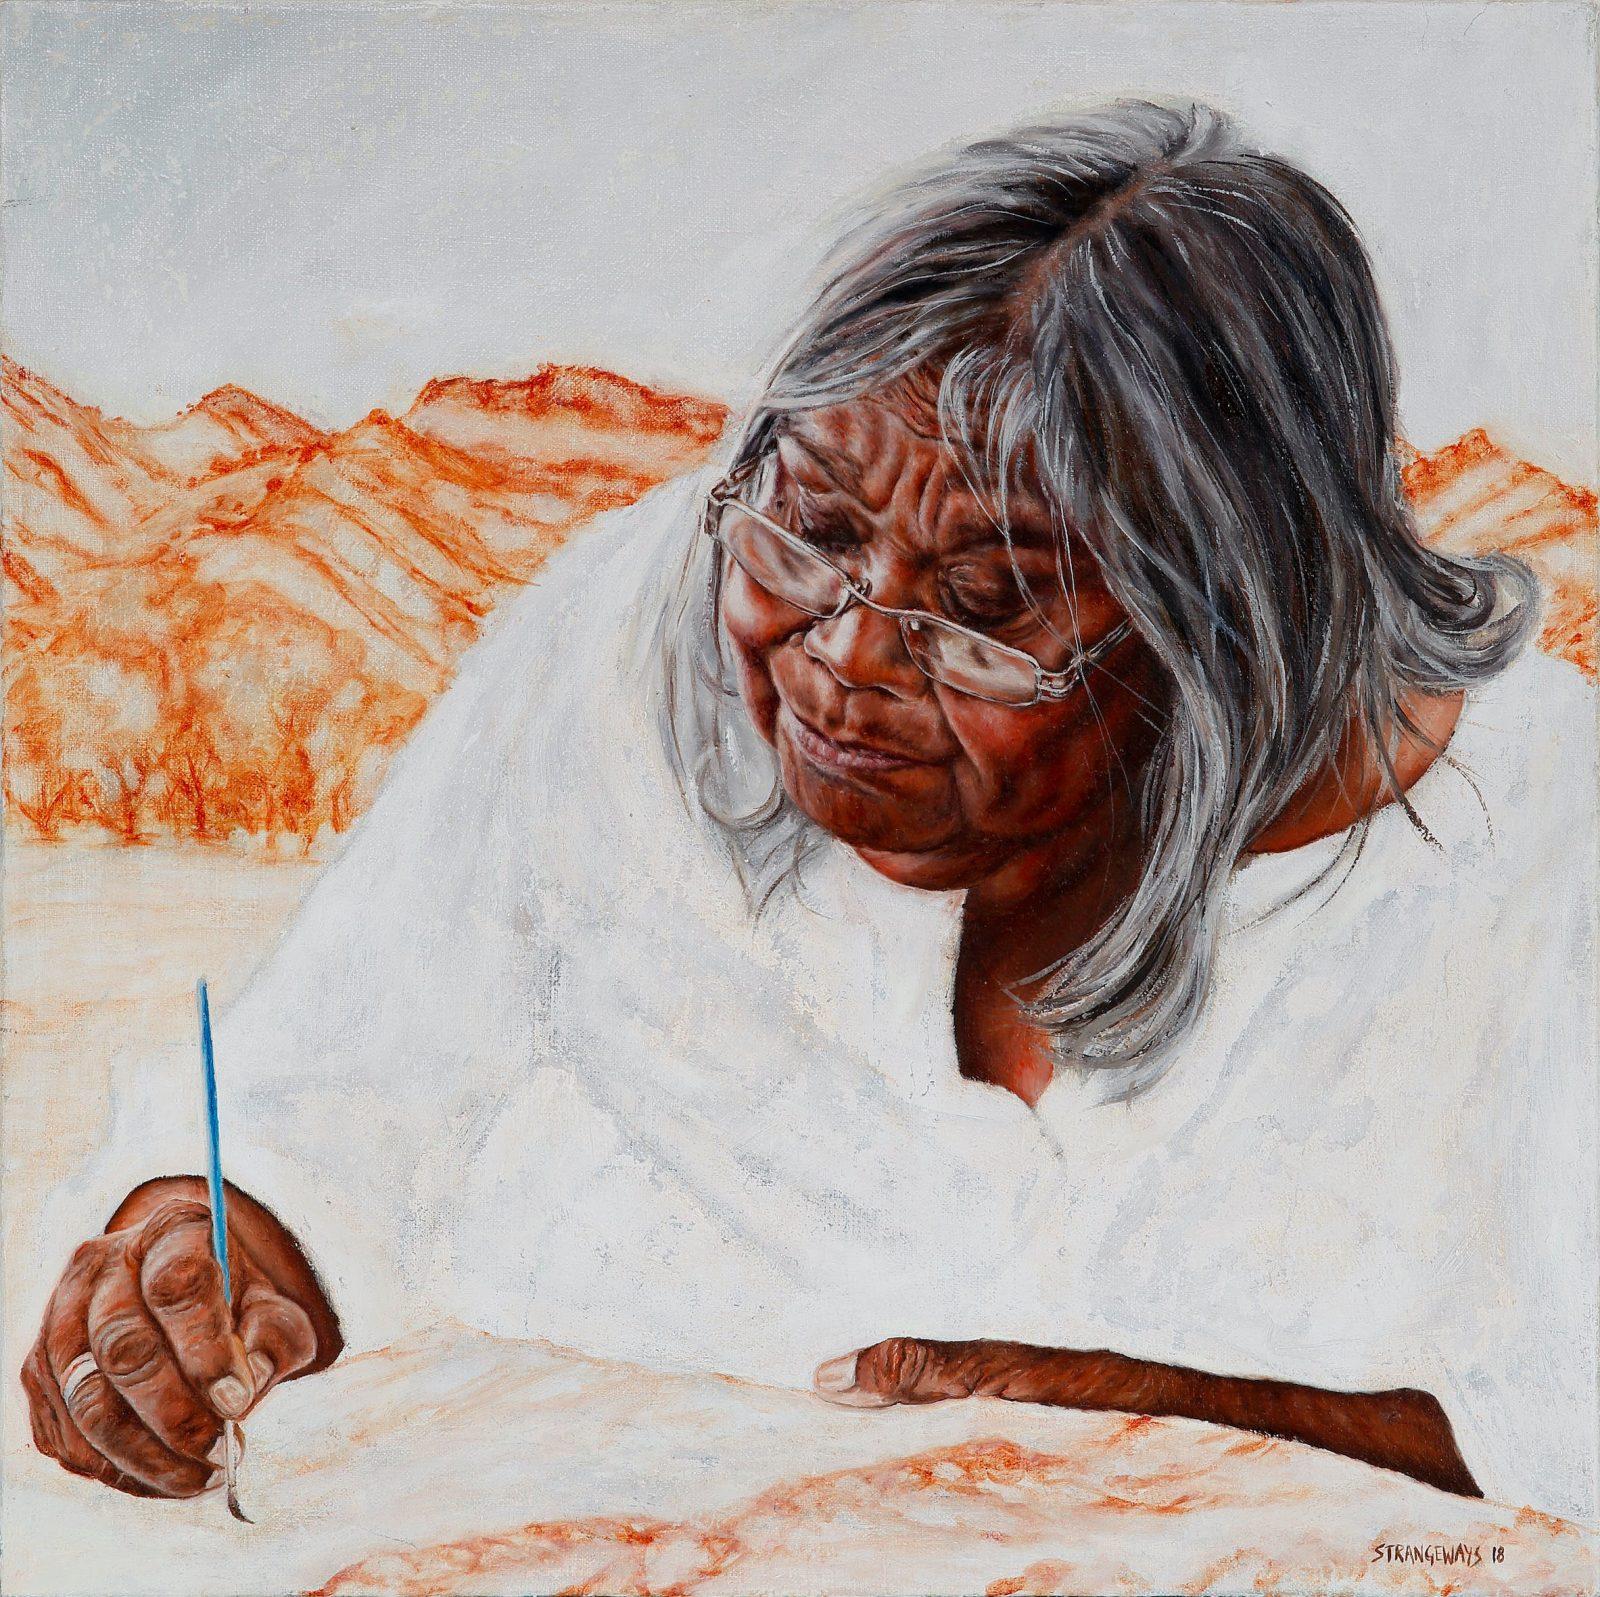 Detail from Al Strangeways portrait, Hills: Kathleen Wallace and the Dancers, Winner 2018